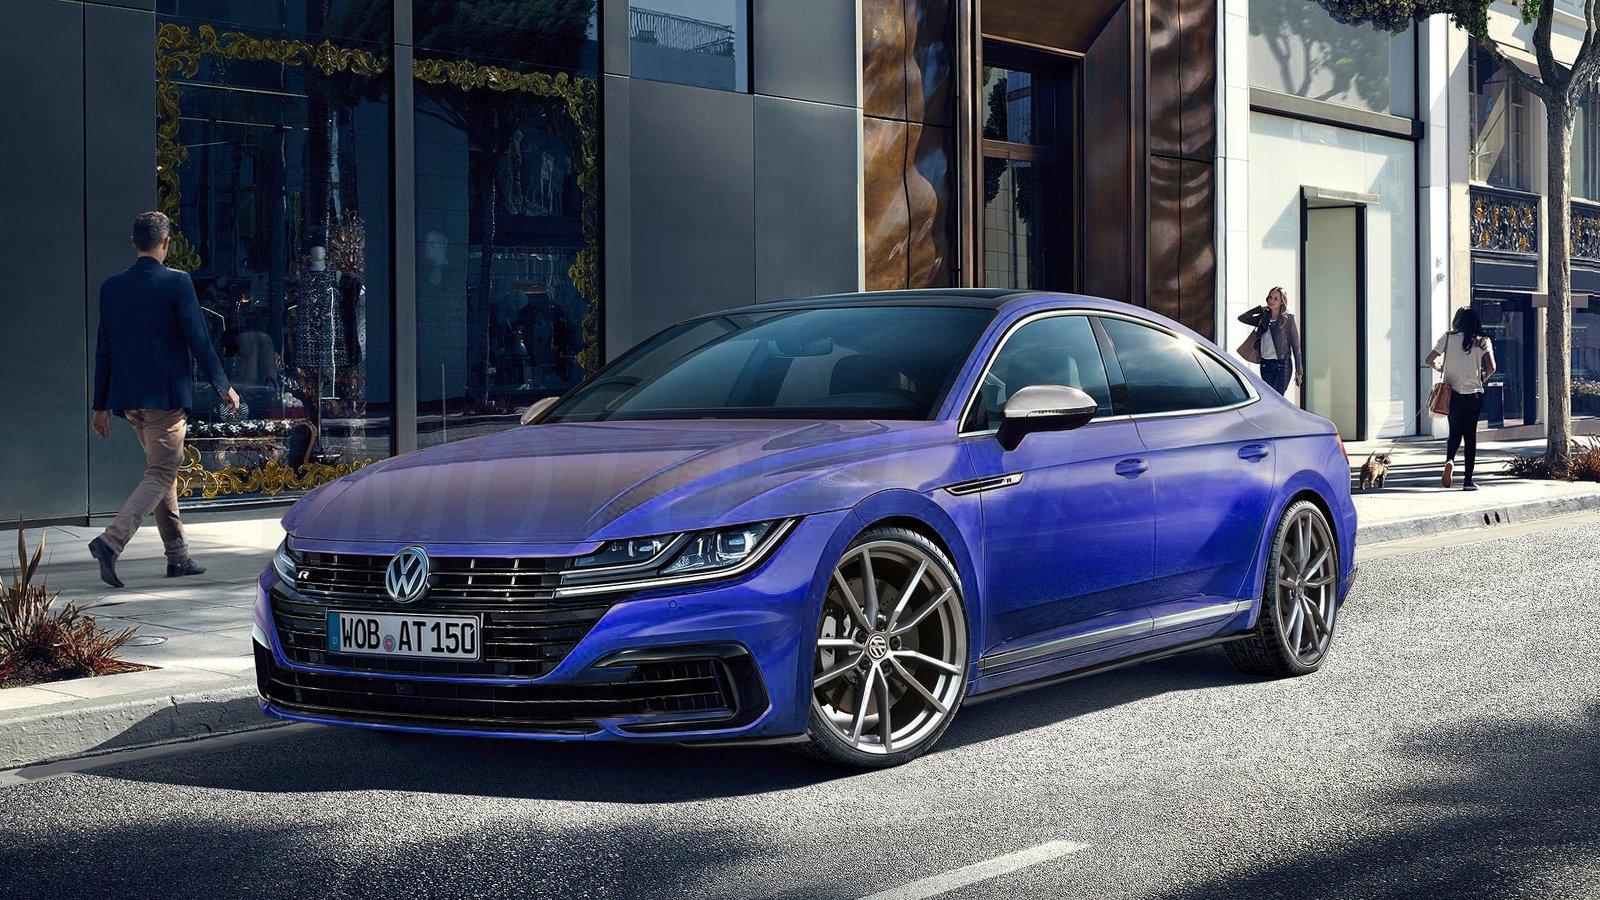 Volkswagen Arteon R rendering by Motofilm.pl